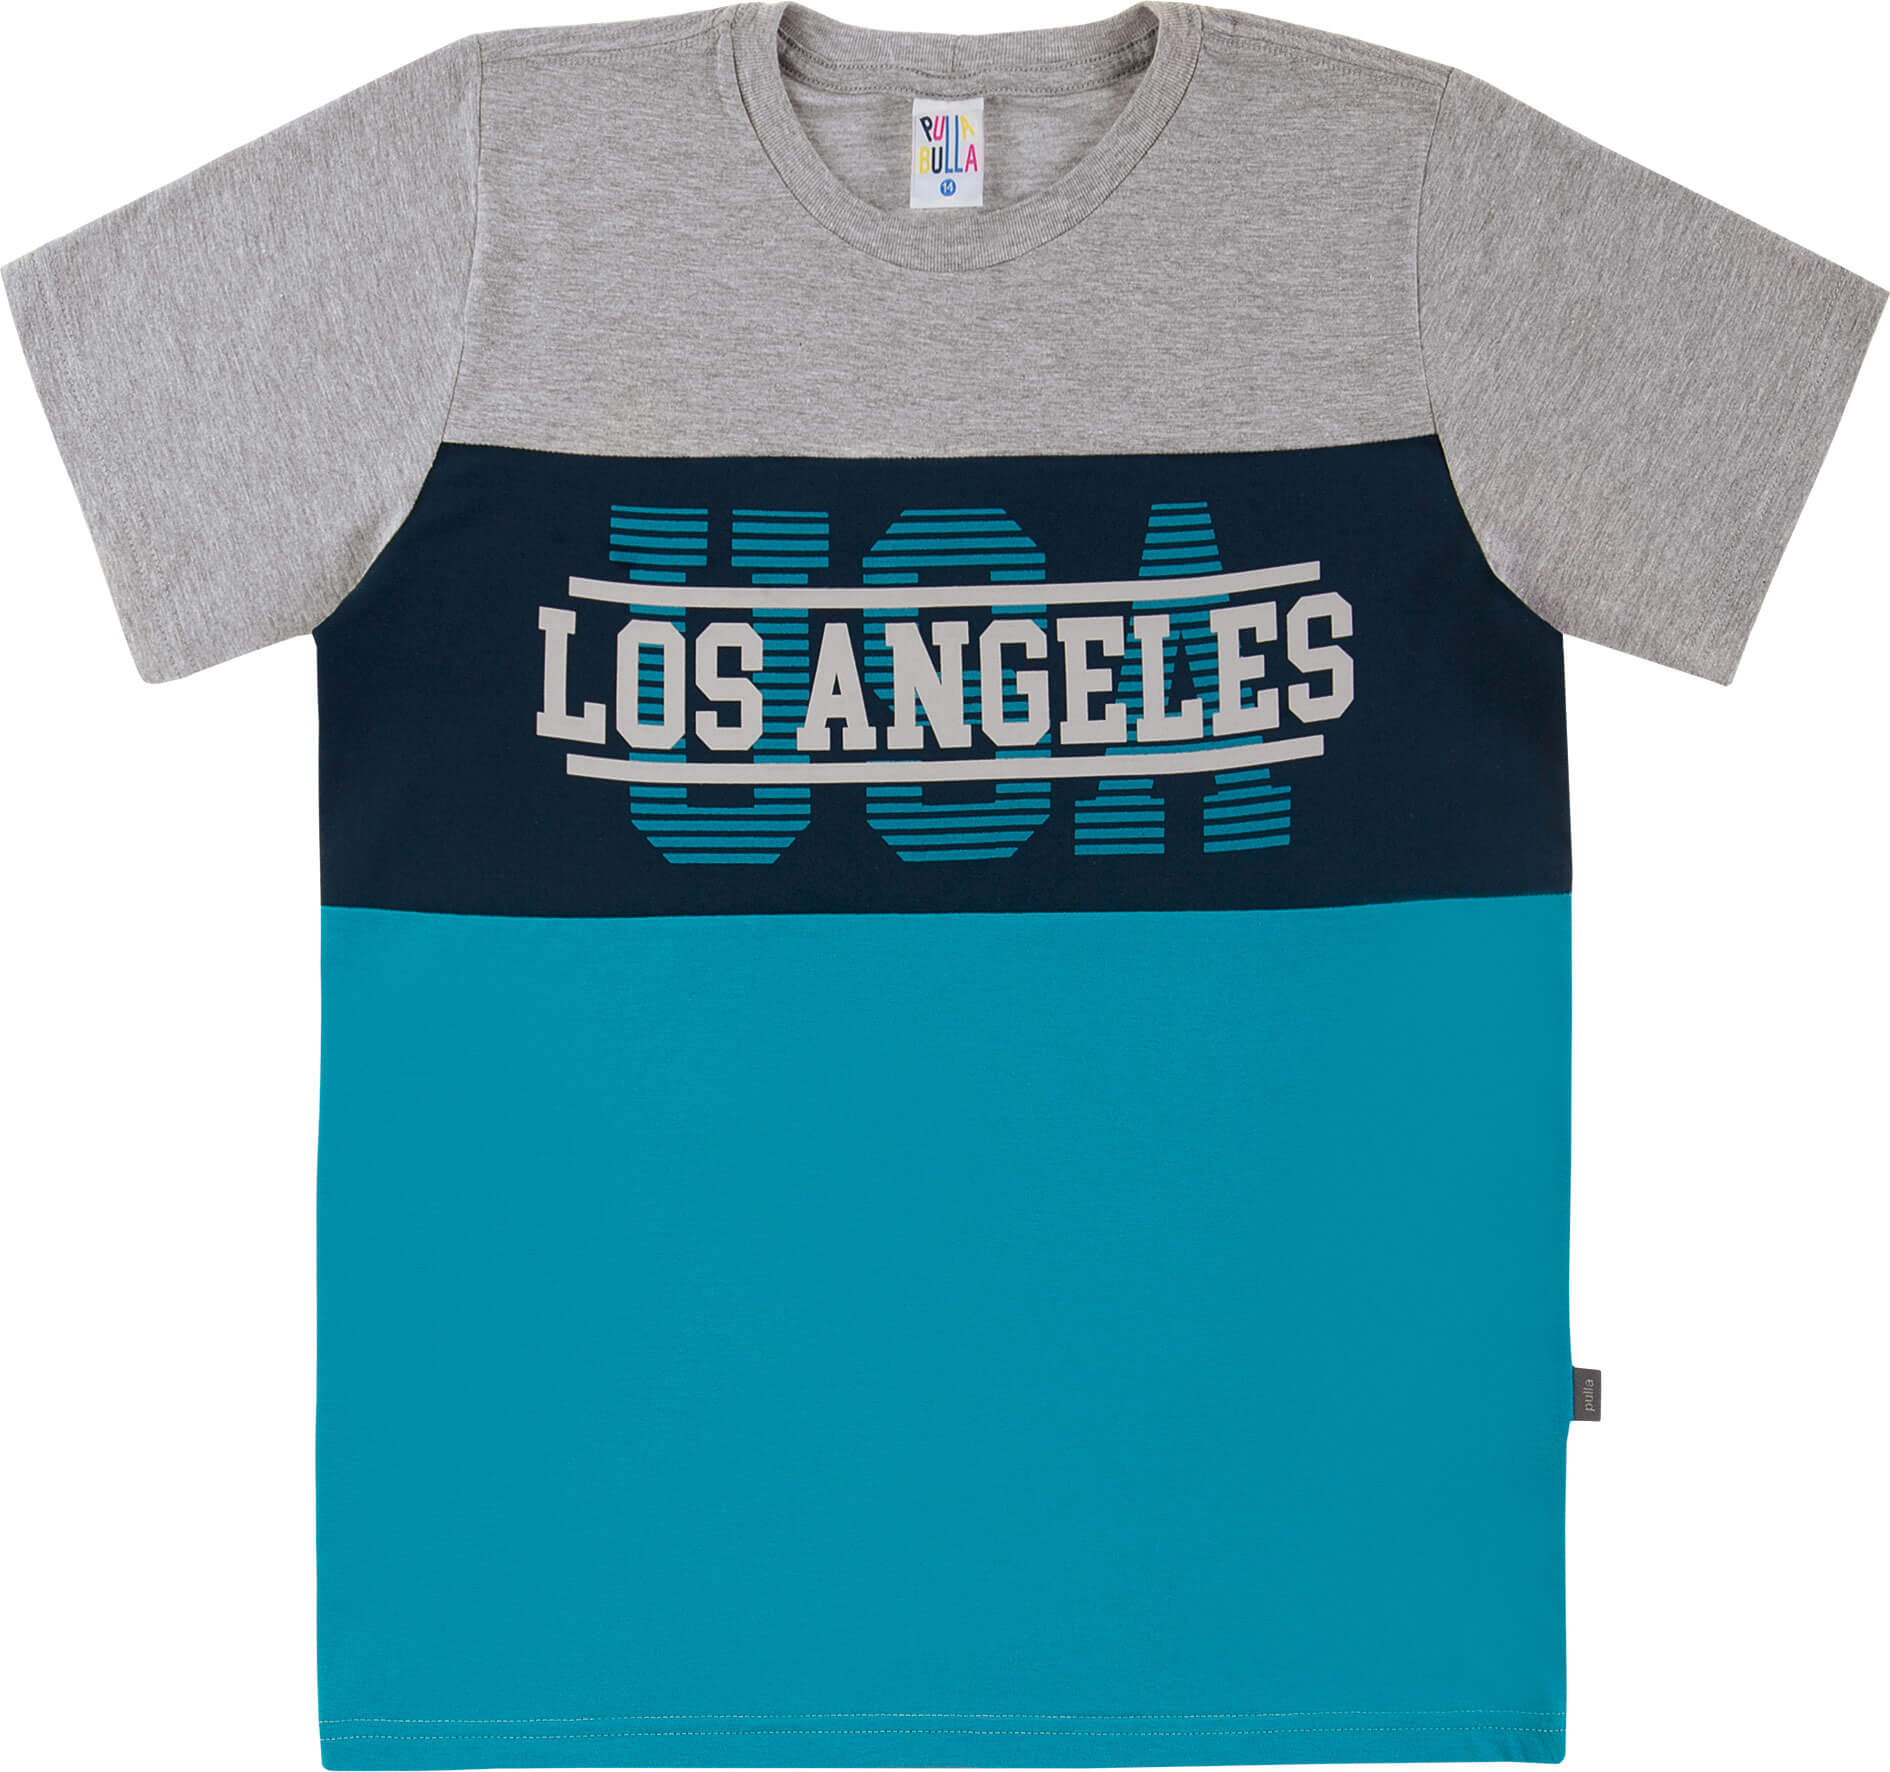 Camiseta Pulla Bulla Los Angeles Mescla